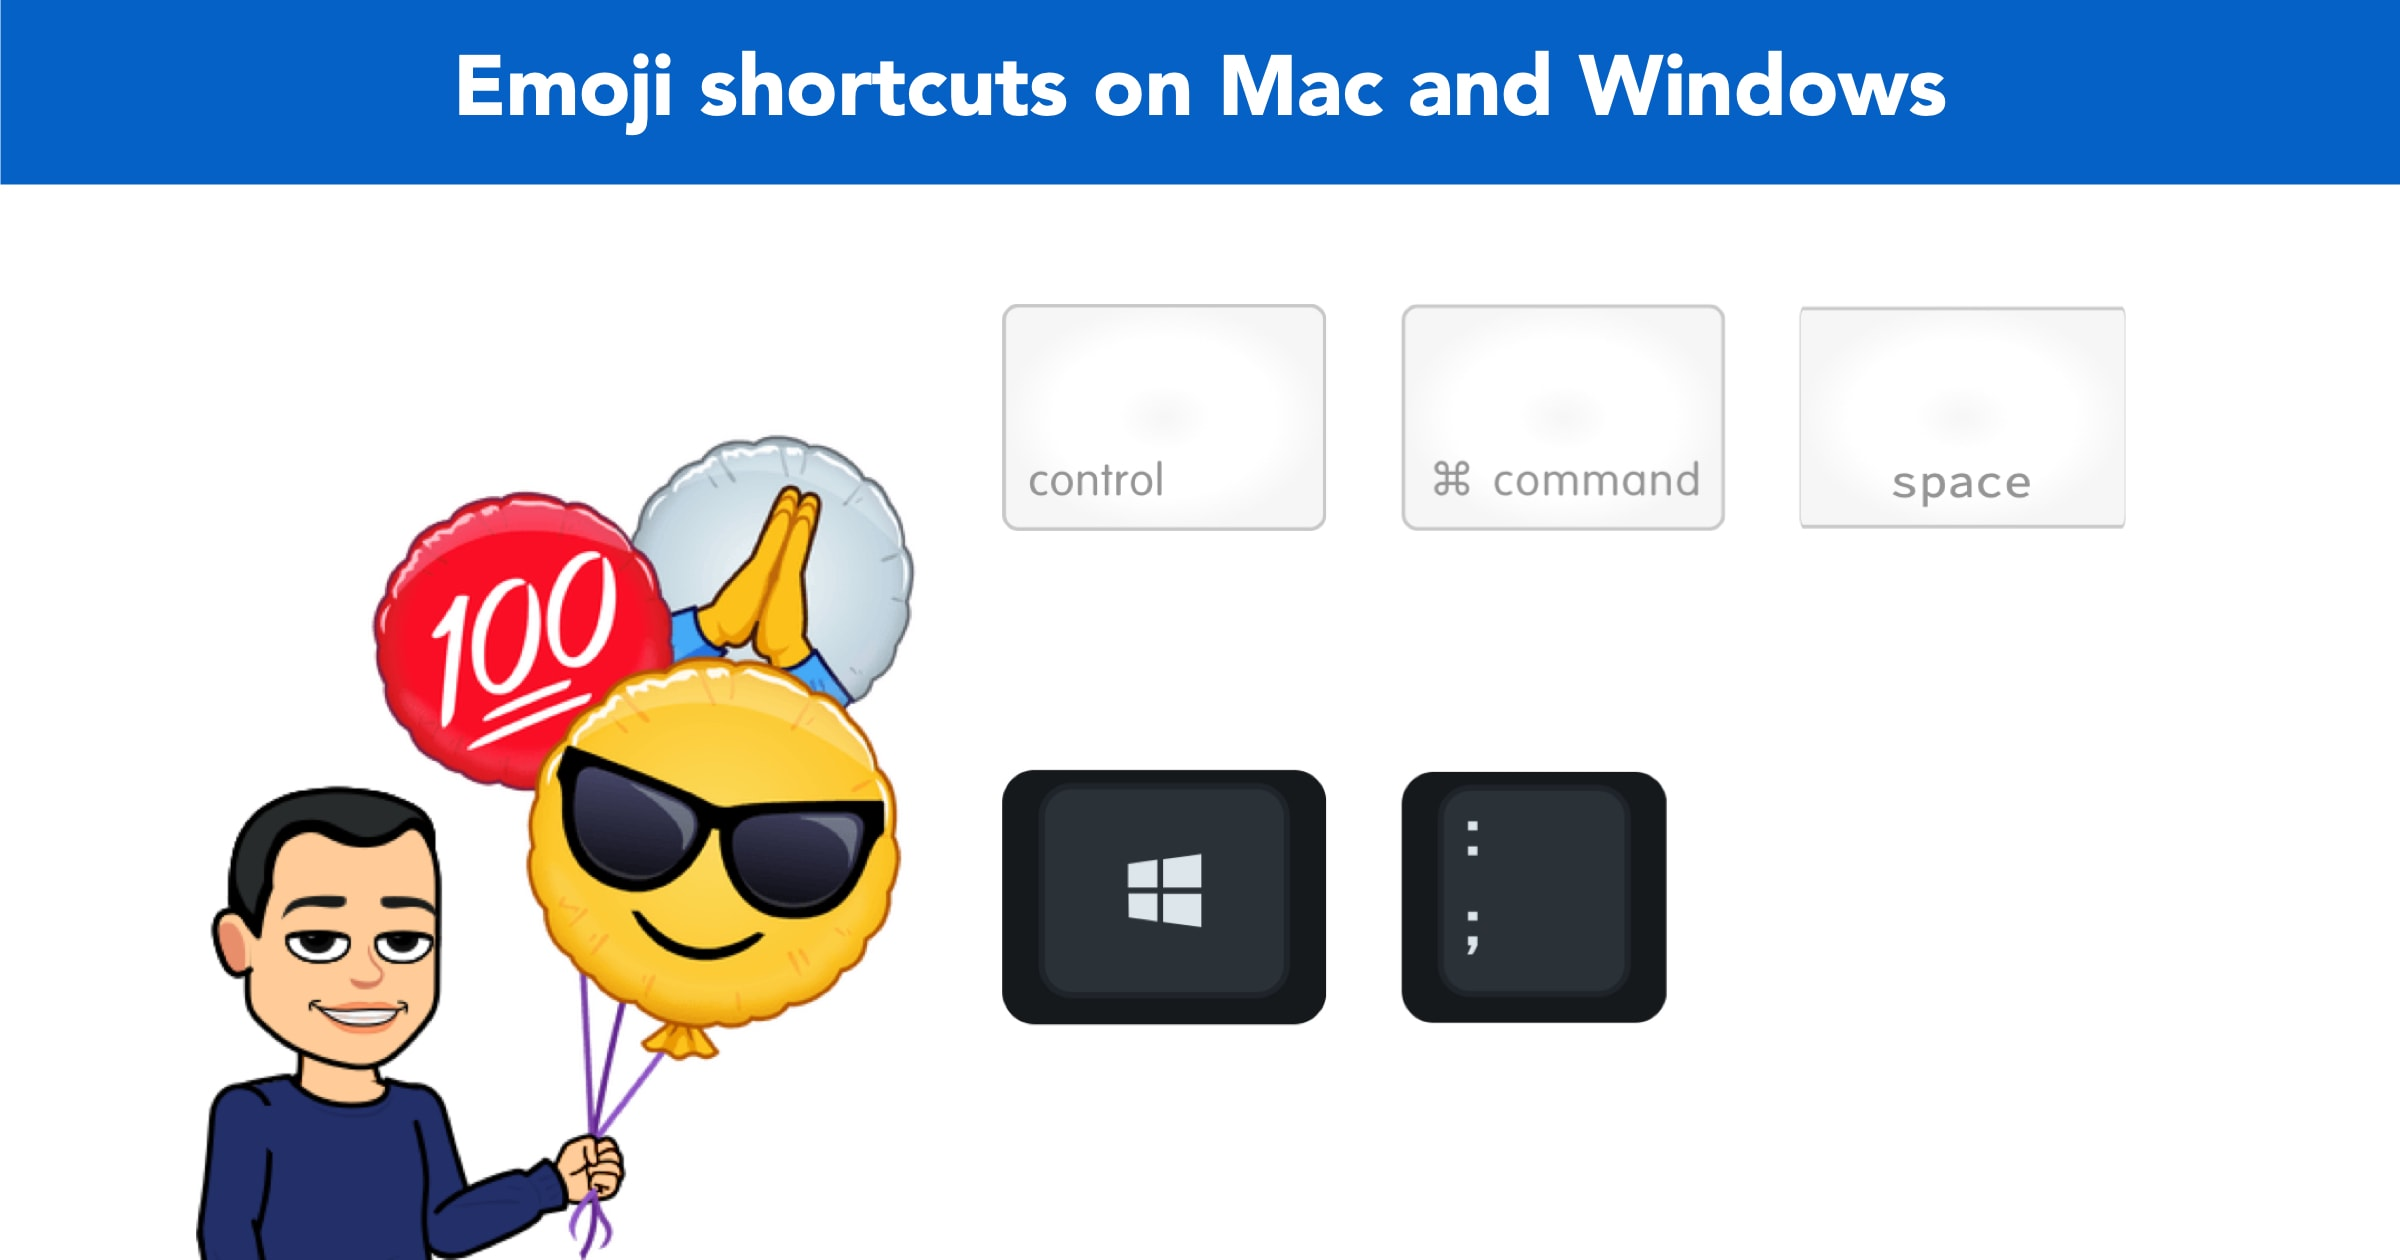 Emoji shortcuts for Mac and Windows